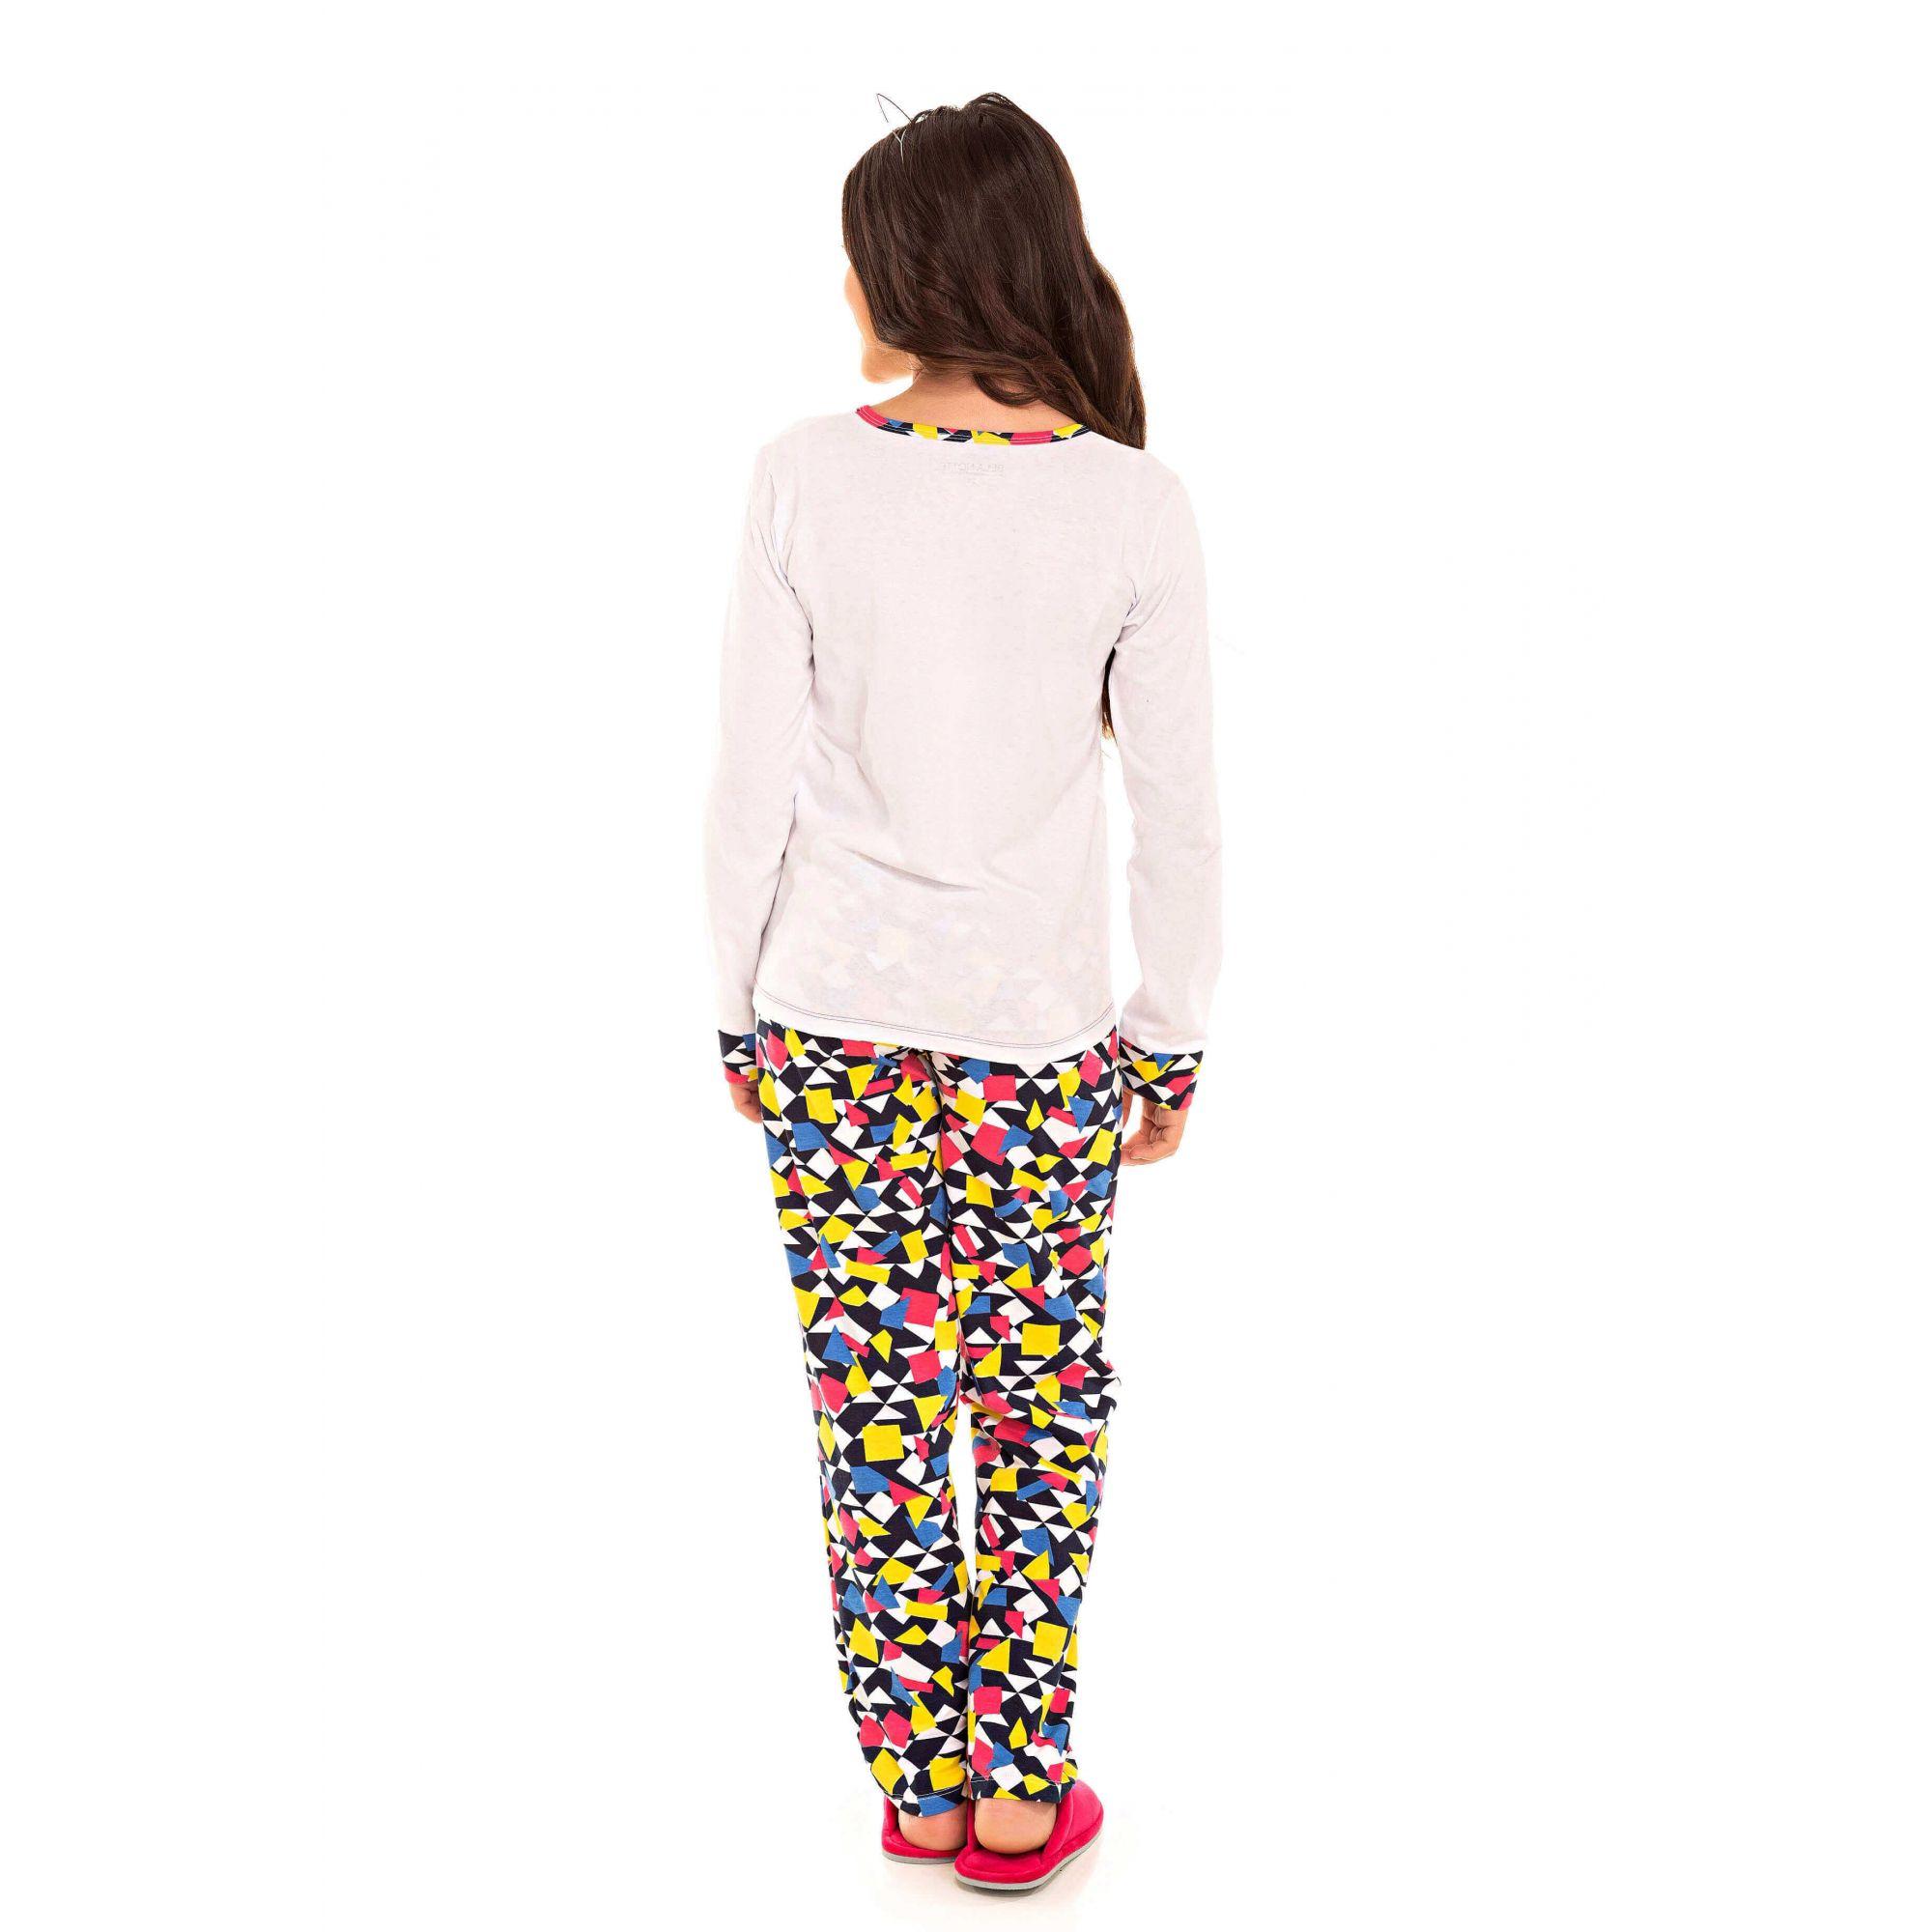 Pijama Juvenil Feminino Belita Colorido